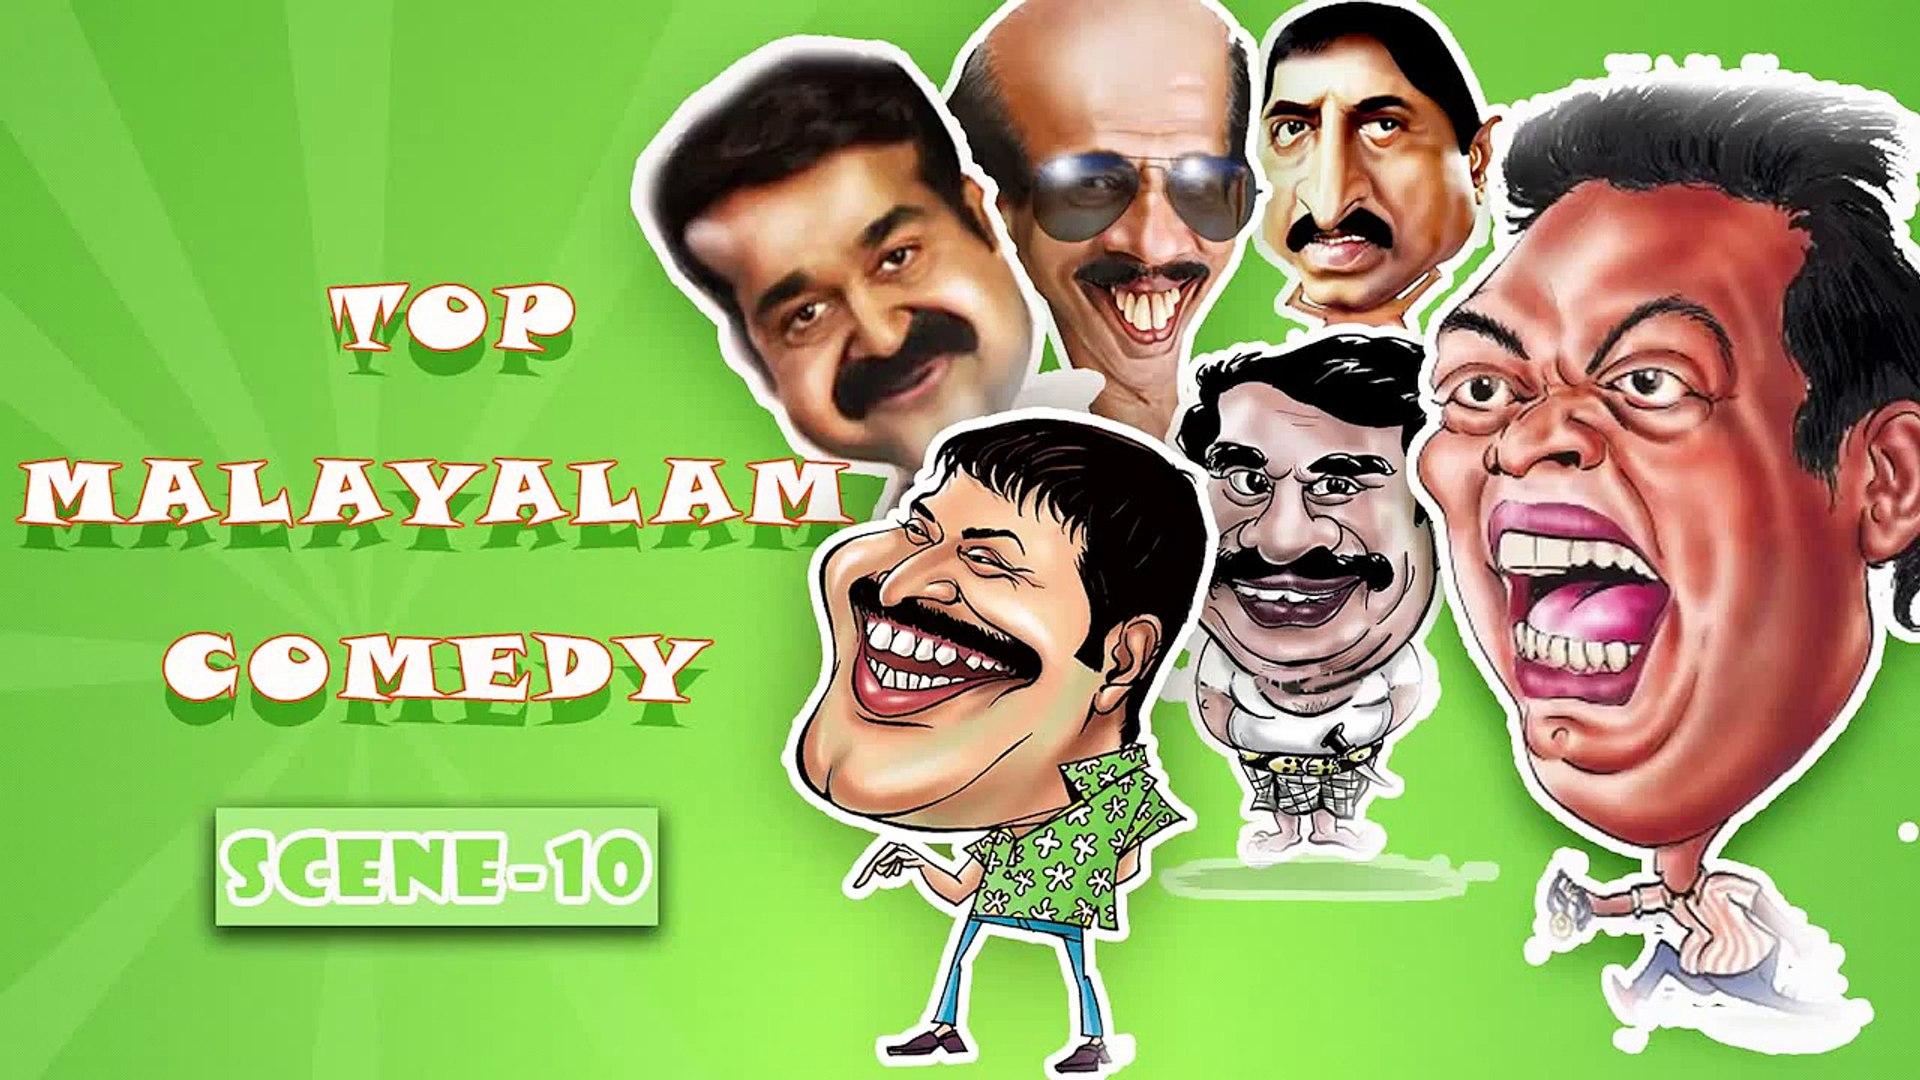 Malayalam Movie Top Comedy Scene 10 | Malayalam Comedy Scenes | Malayalam Movie Comedy Sce